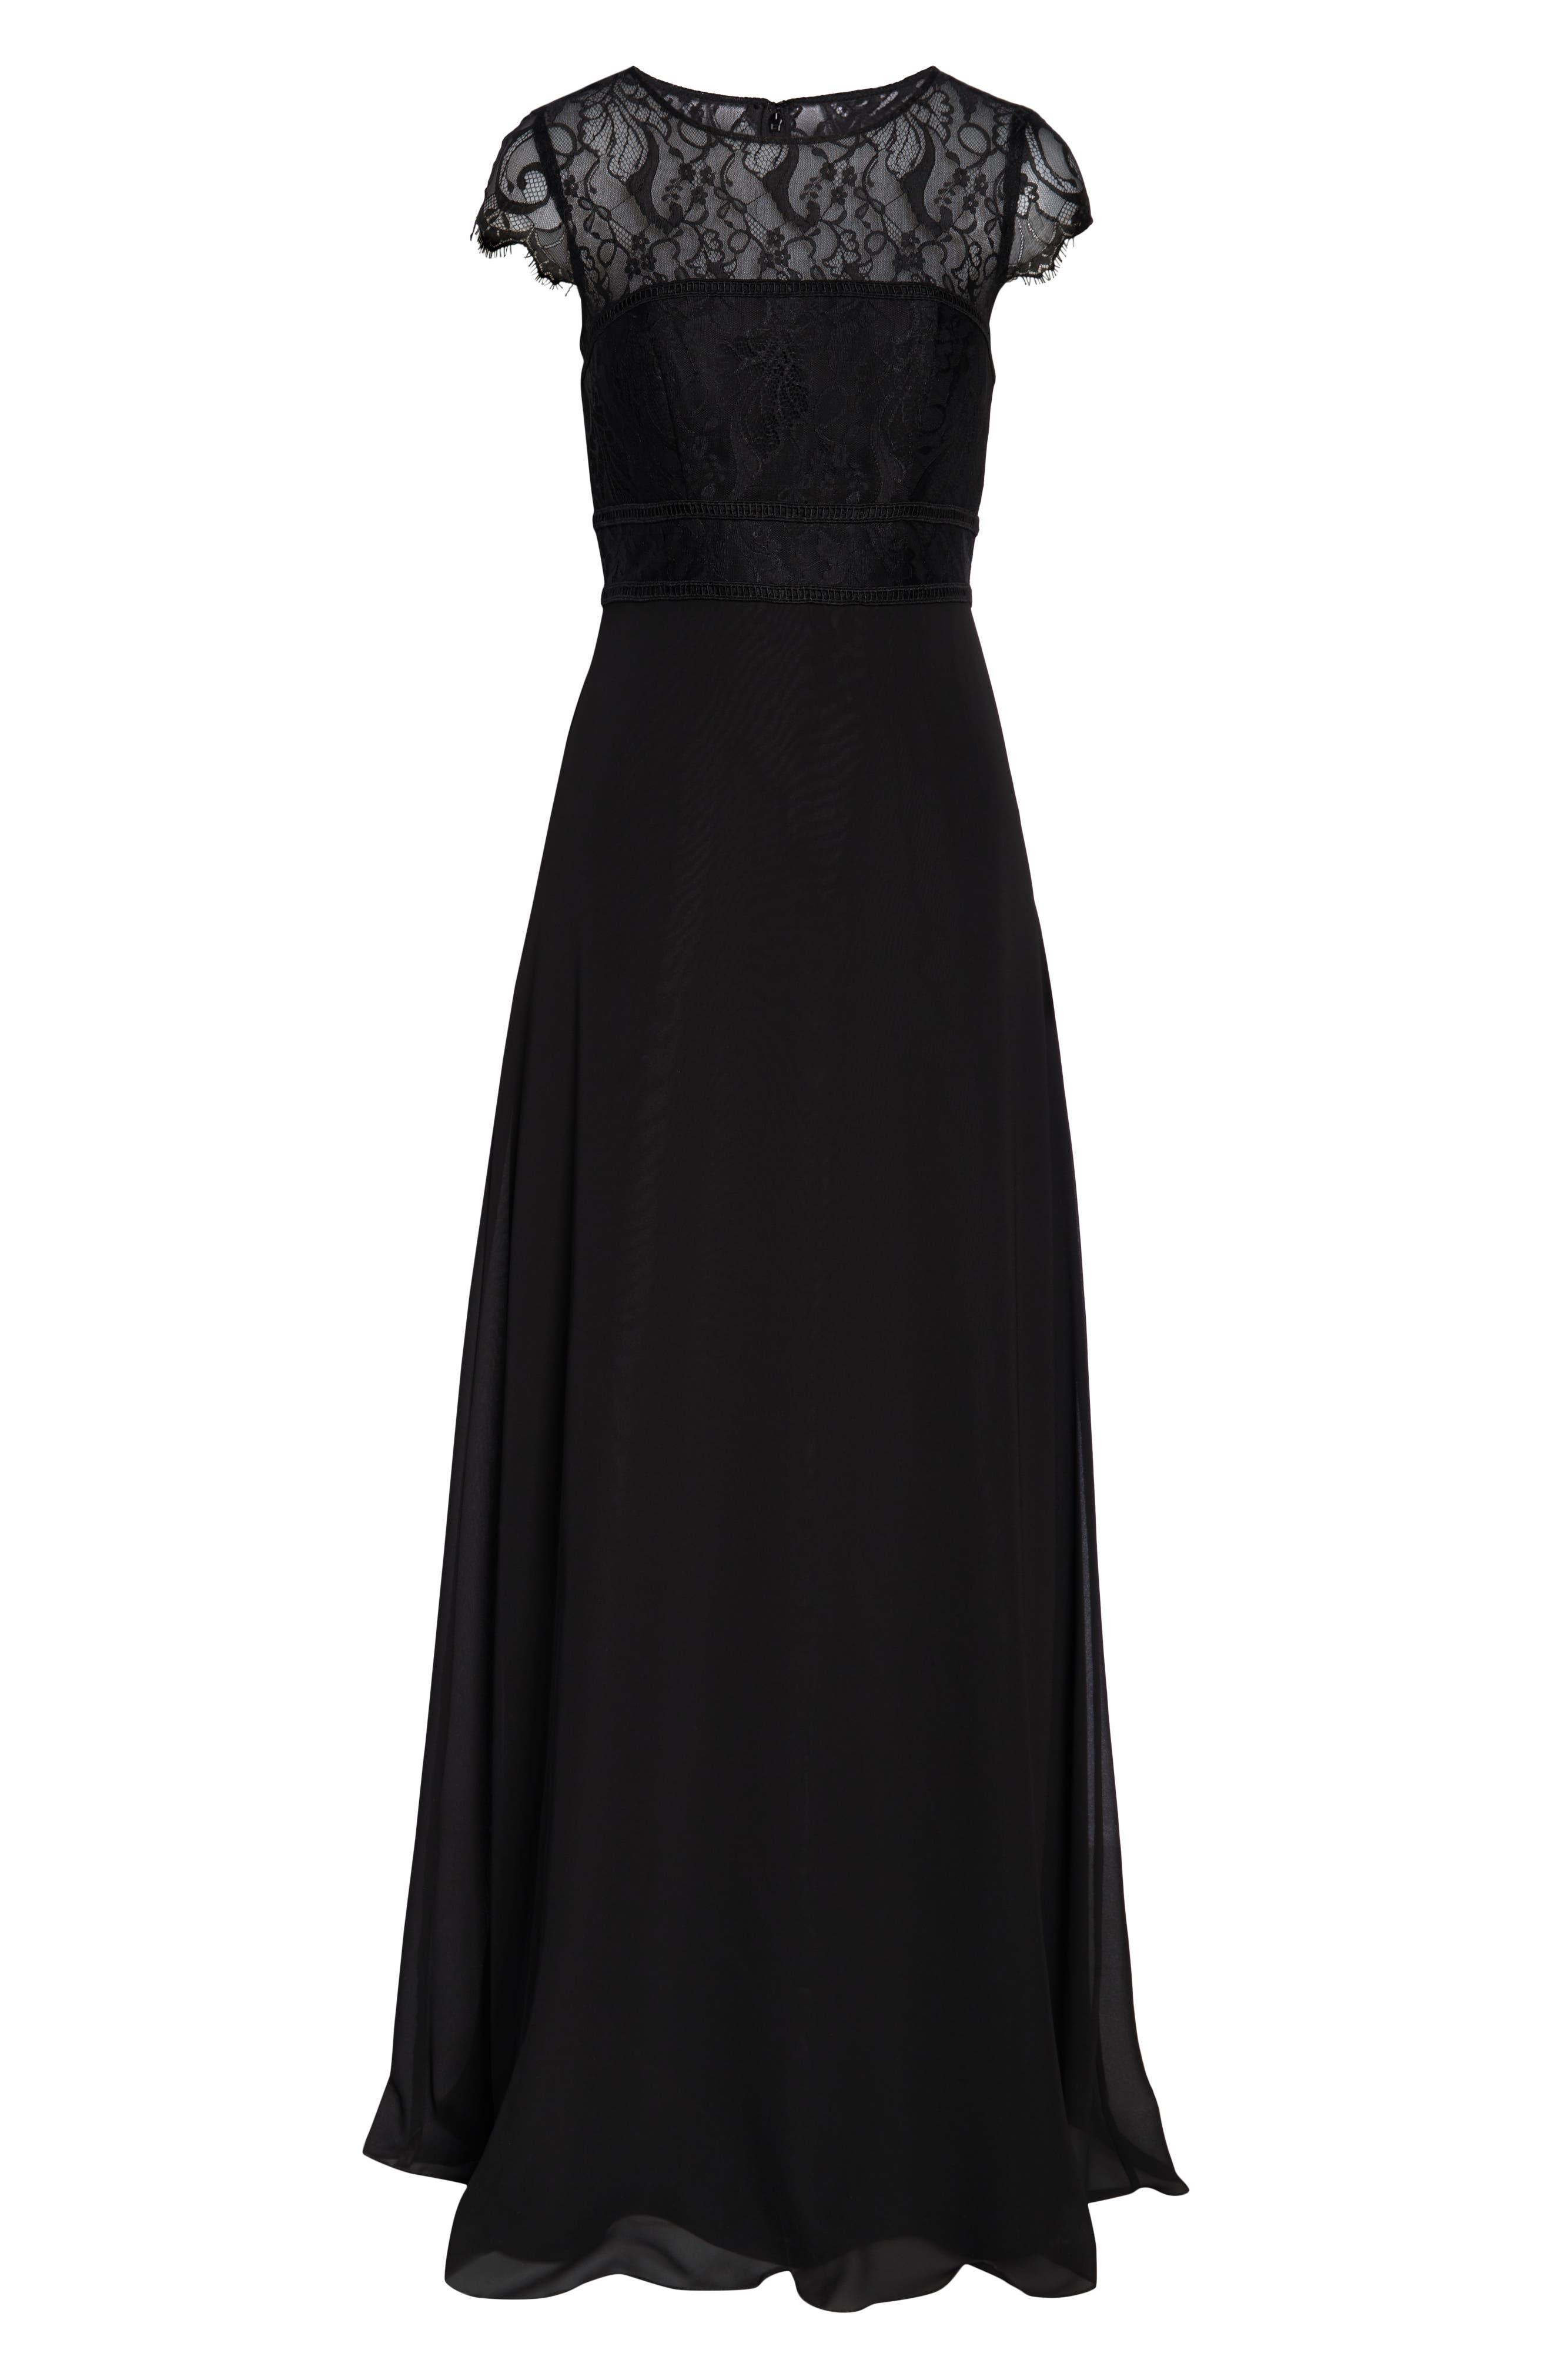 HAYLEY PAIGE OCCASIONS,                             Lace Bodice Chiffon Evening Dress,                             Alternate thumbnail 7, color,                             BLACK / BLACK